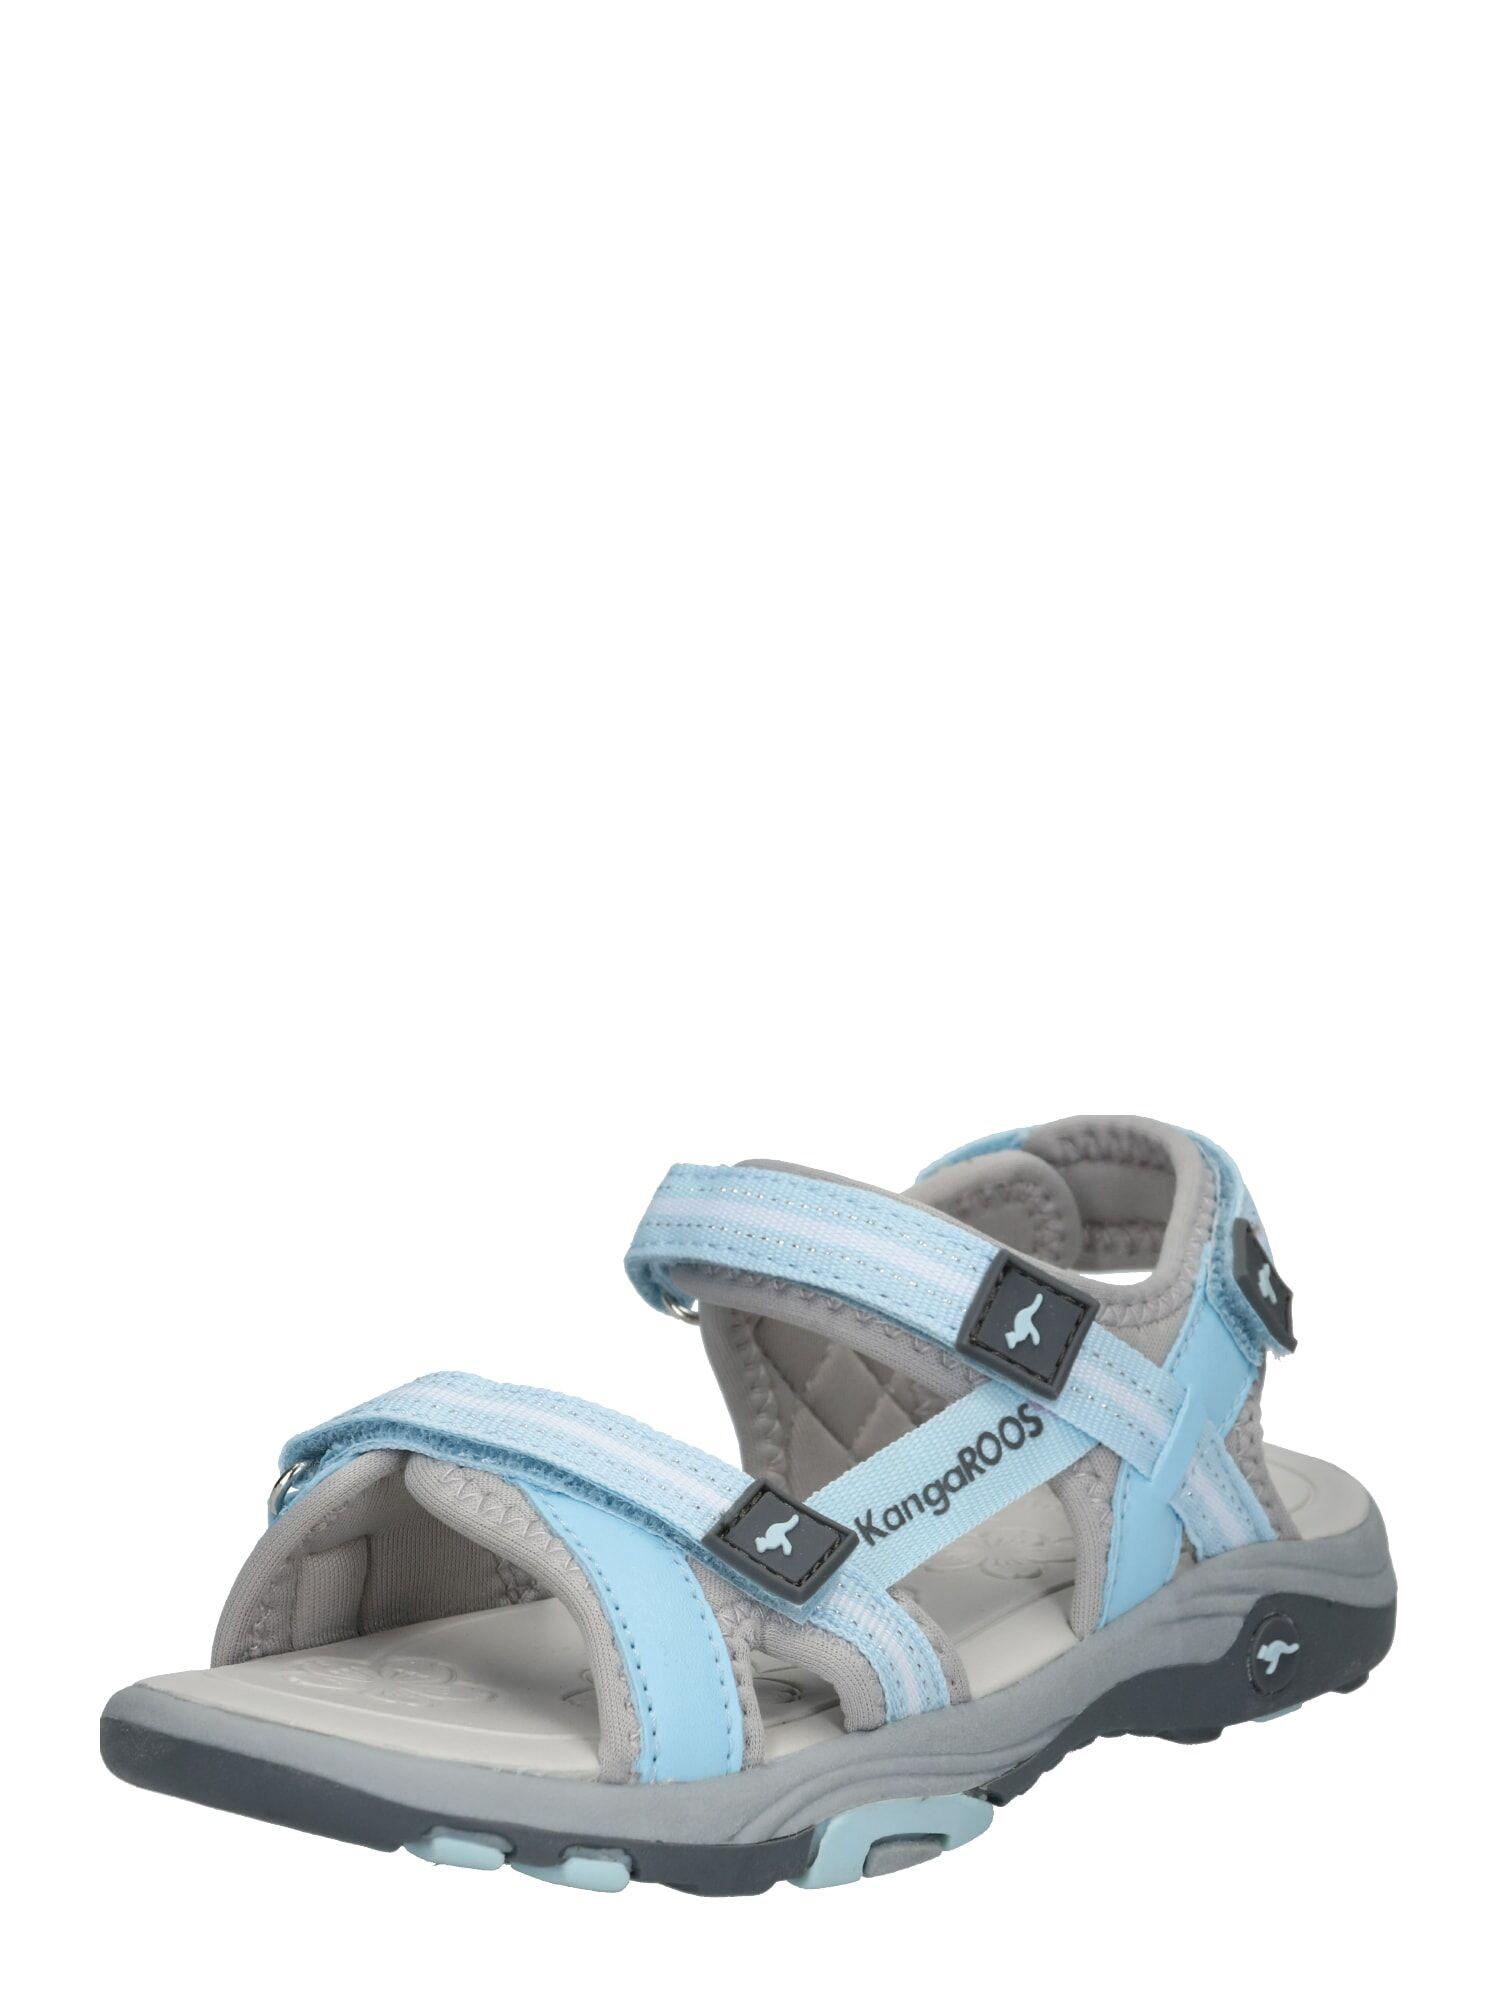 KangaROOS Chaussures ouvertes 'K-Leni'  - Bleu - Taille: 34 - boy